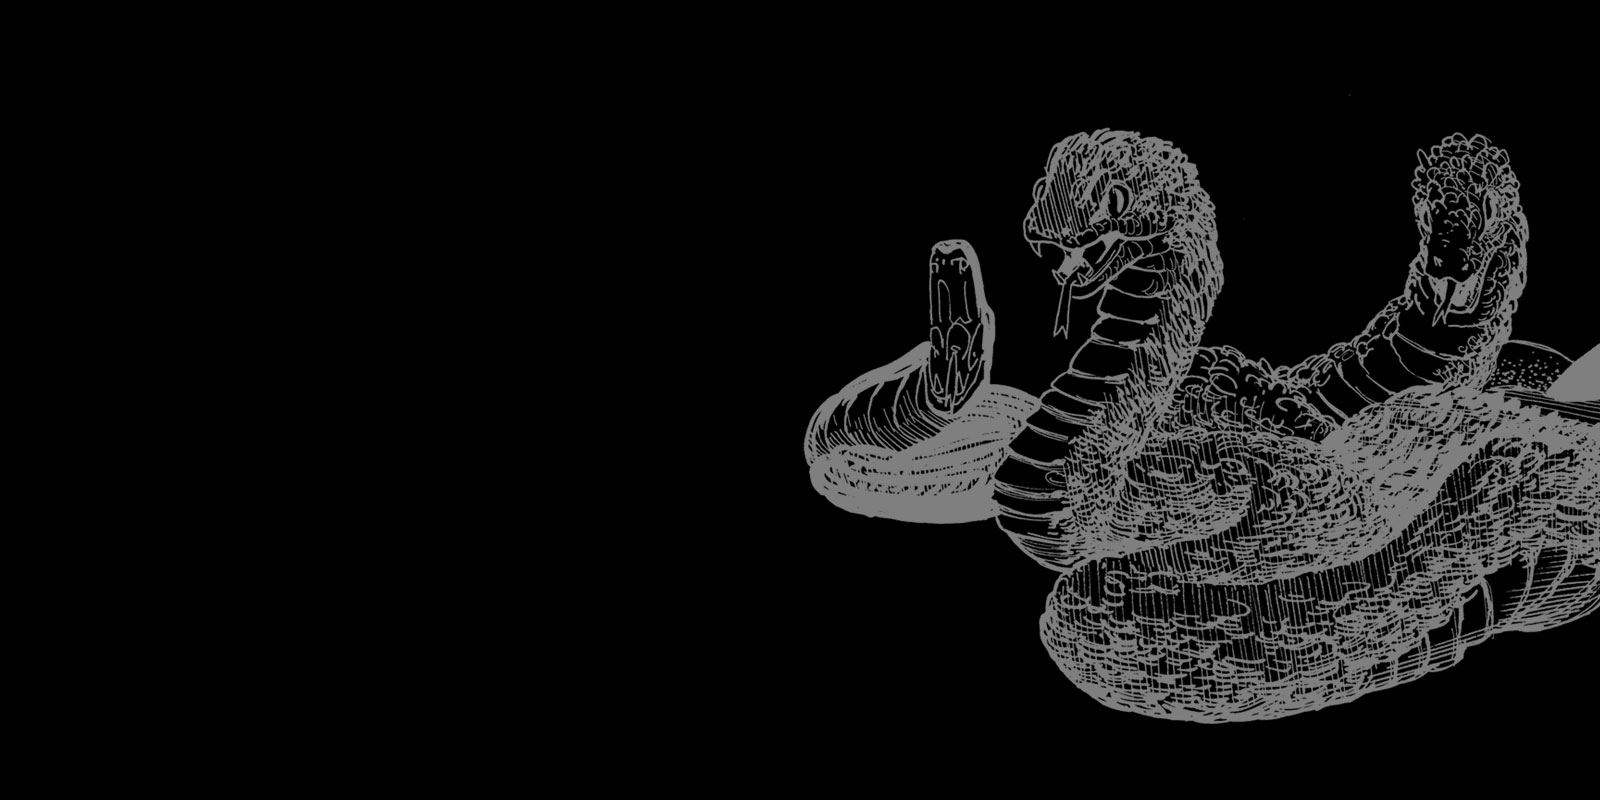 gory-deaths-bg-snakes.jpg